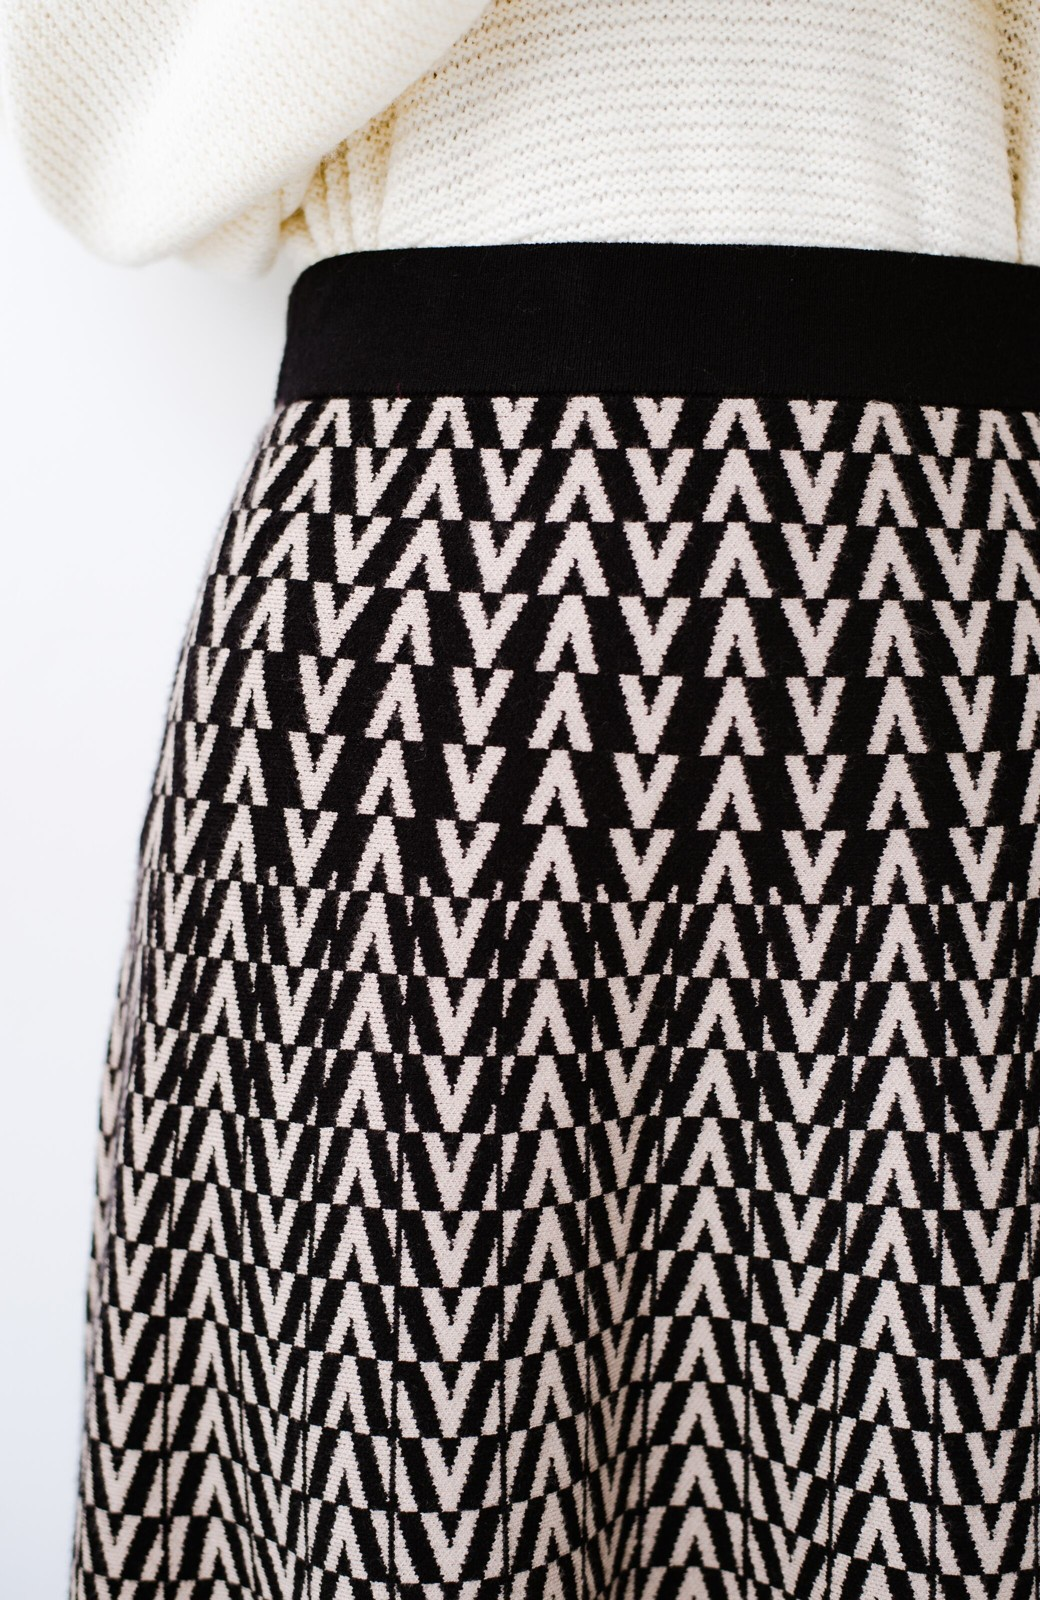 haco! シンプルトップスと合わせるだけでコーデがオシャレ&華やかになる ジャカードニットスカート <ブラック系その他>の商品写真8